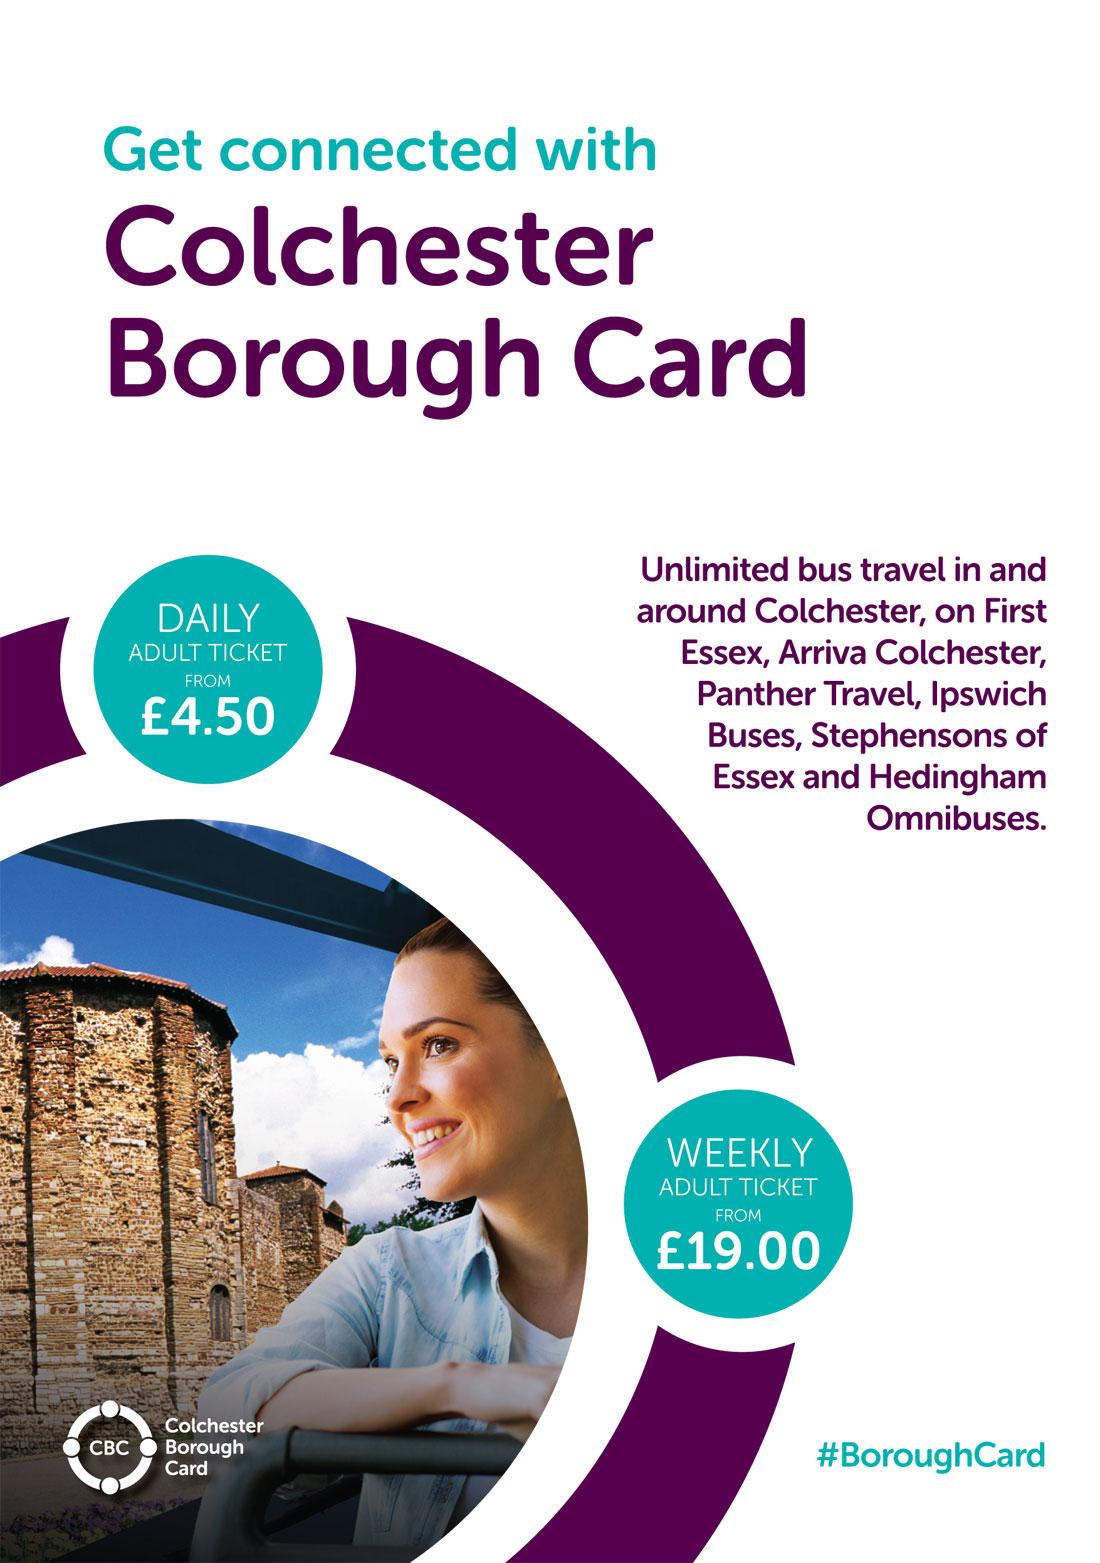 Colchester Borough Card